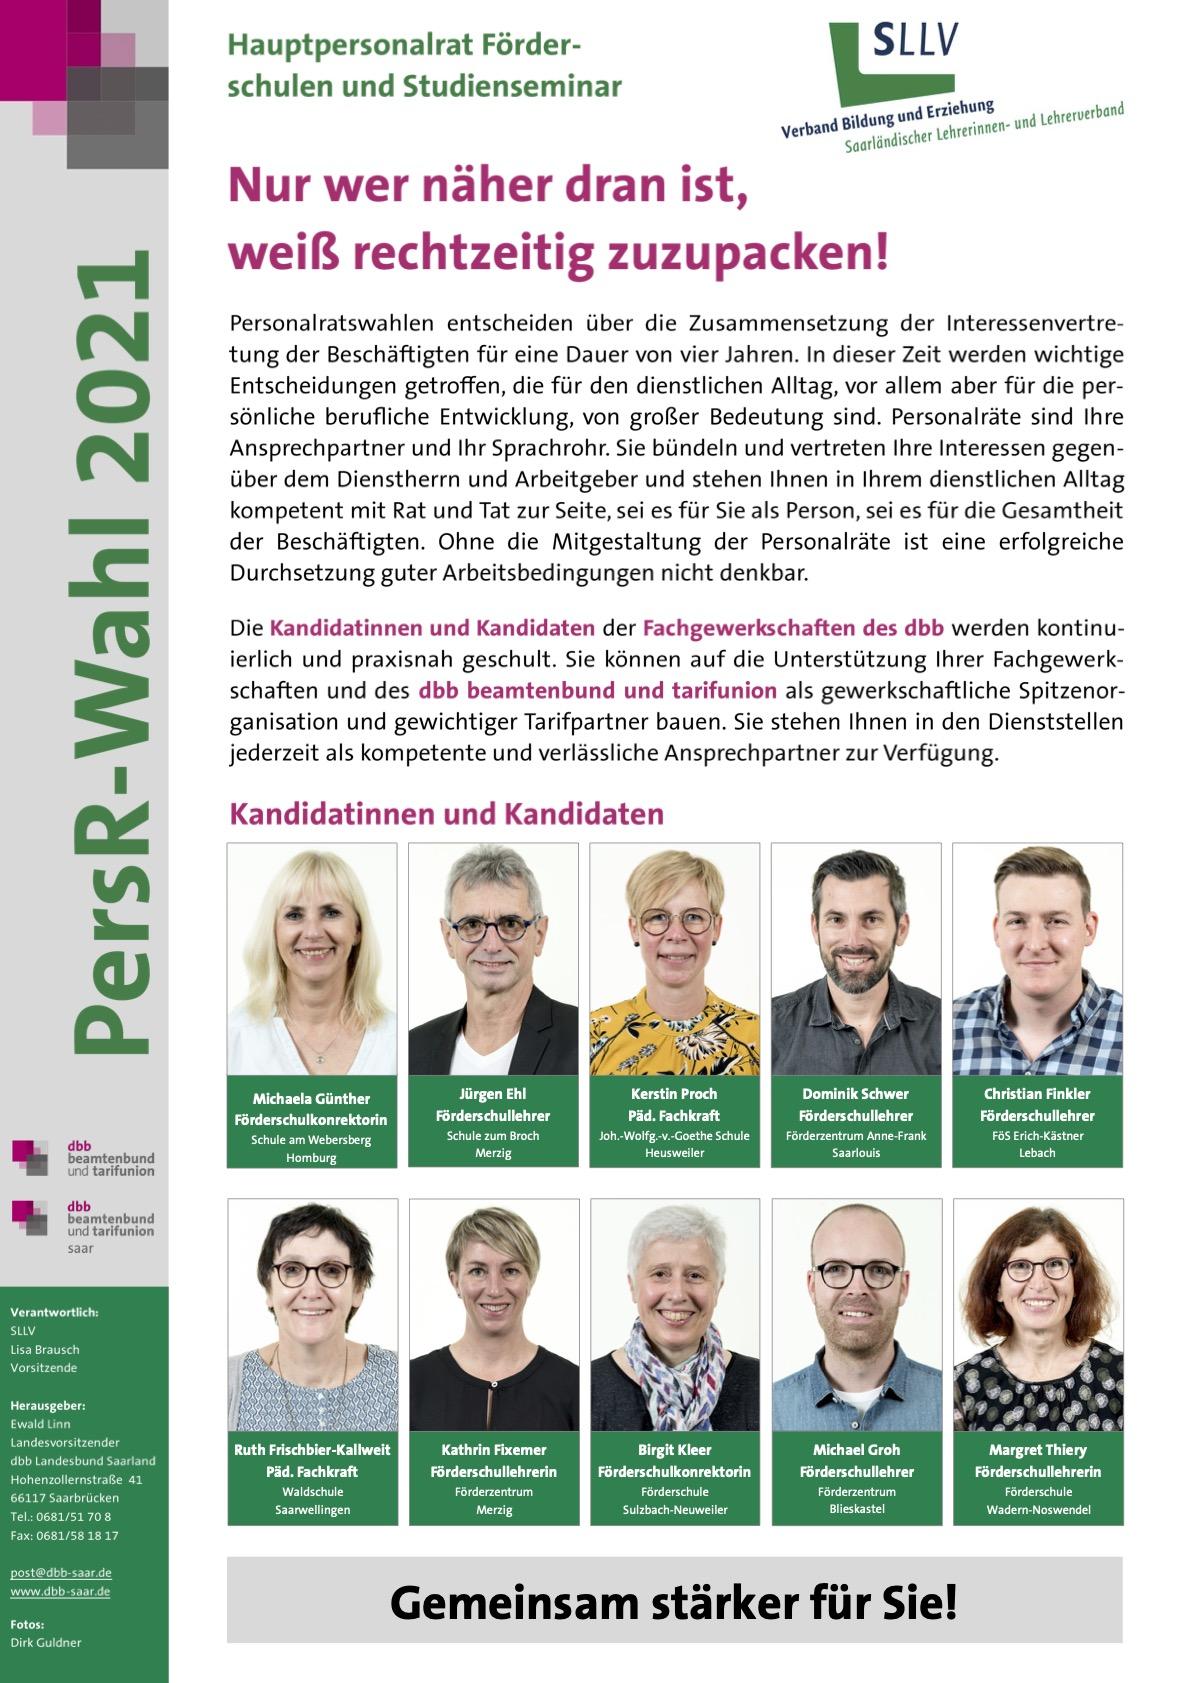 23_SLLV_HPR-Frderschule_Flugblatt_PersR_Wahl_01